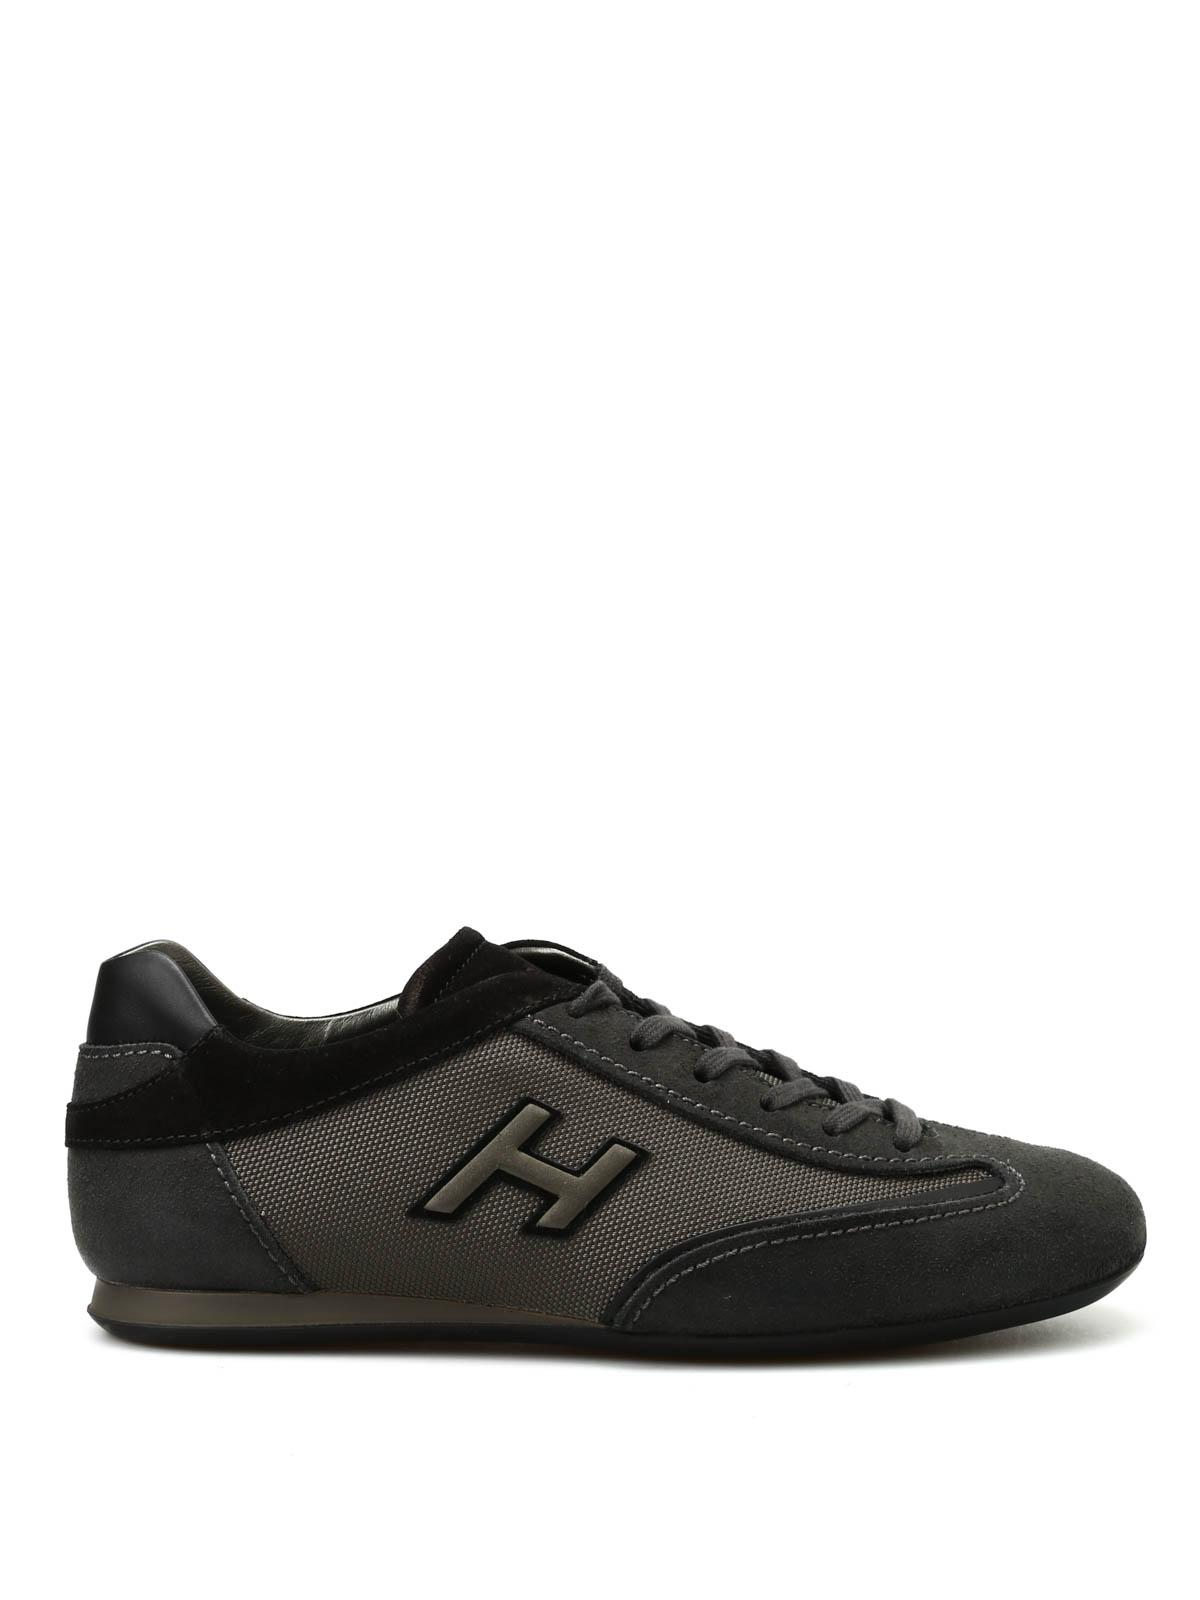 Sneakers Hogan - Olympia slash H flock - HXM05701682E1M209V ...